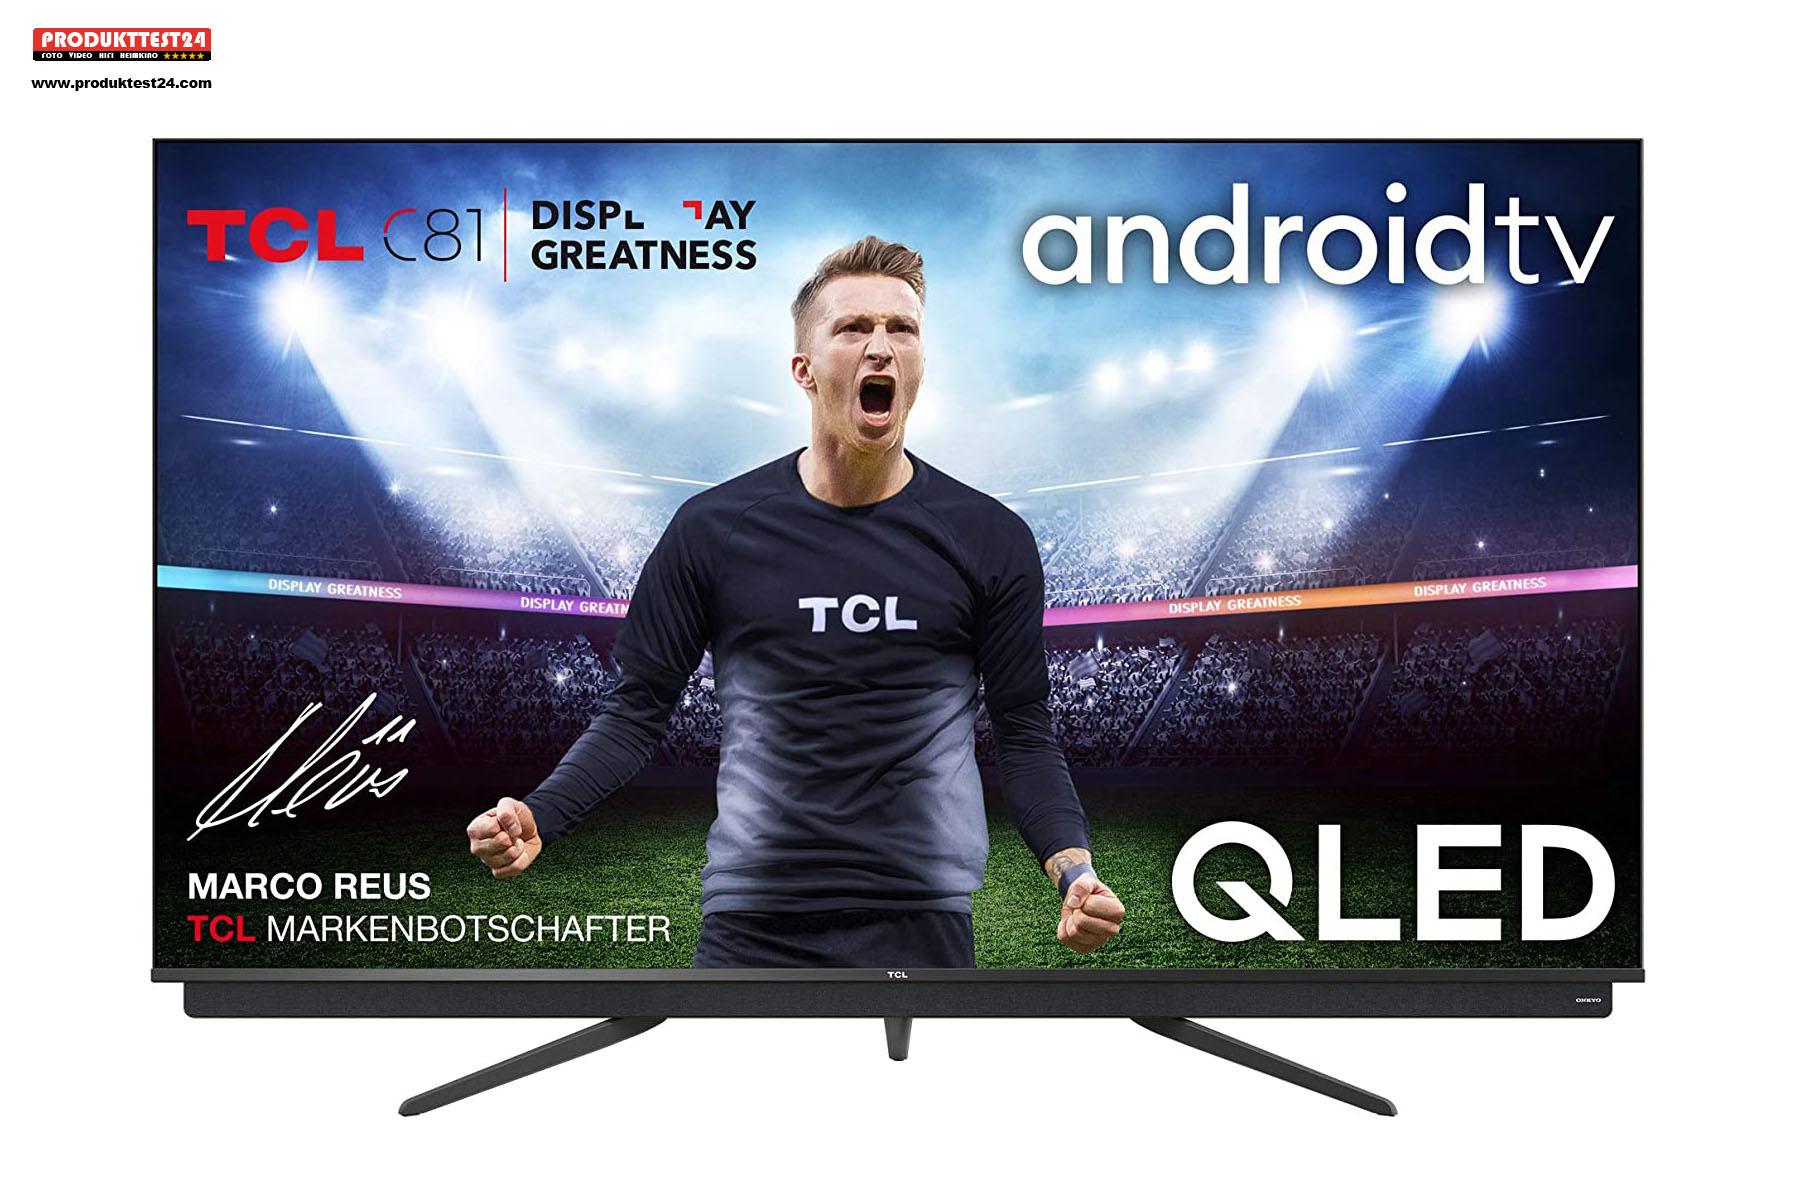 Der TCL 55C815 QLED 4K-Fernseher kann HDR10+, Dolby Vision und Dolby Atmos